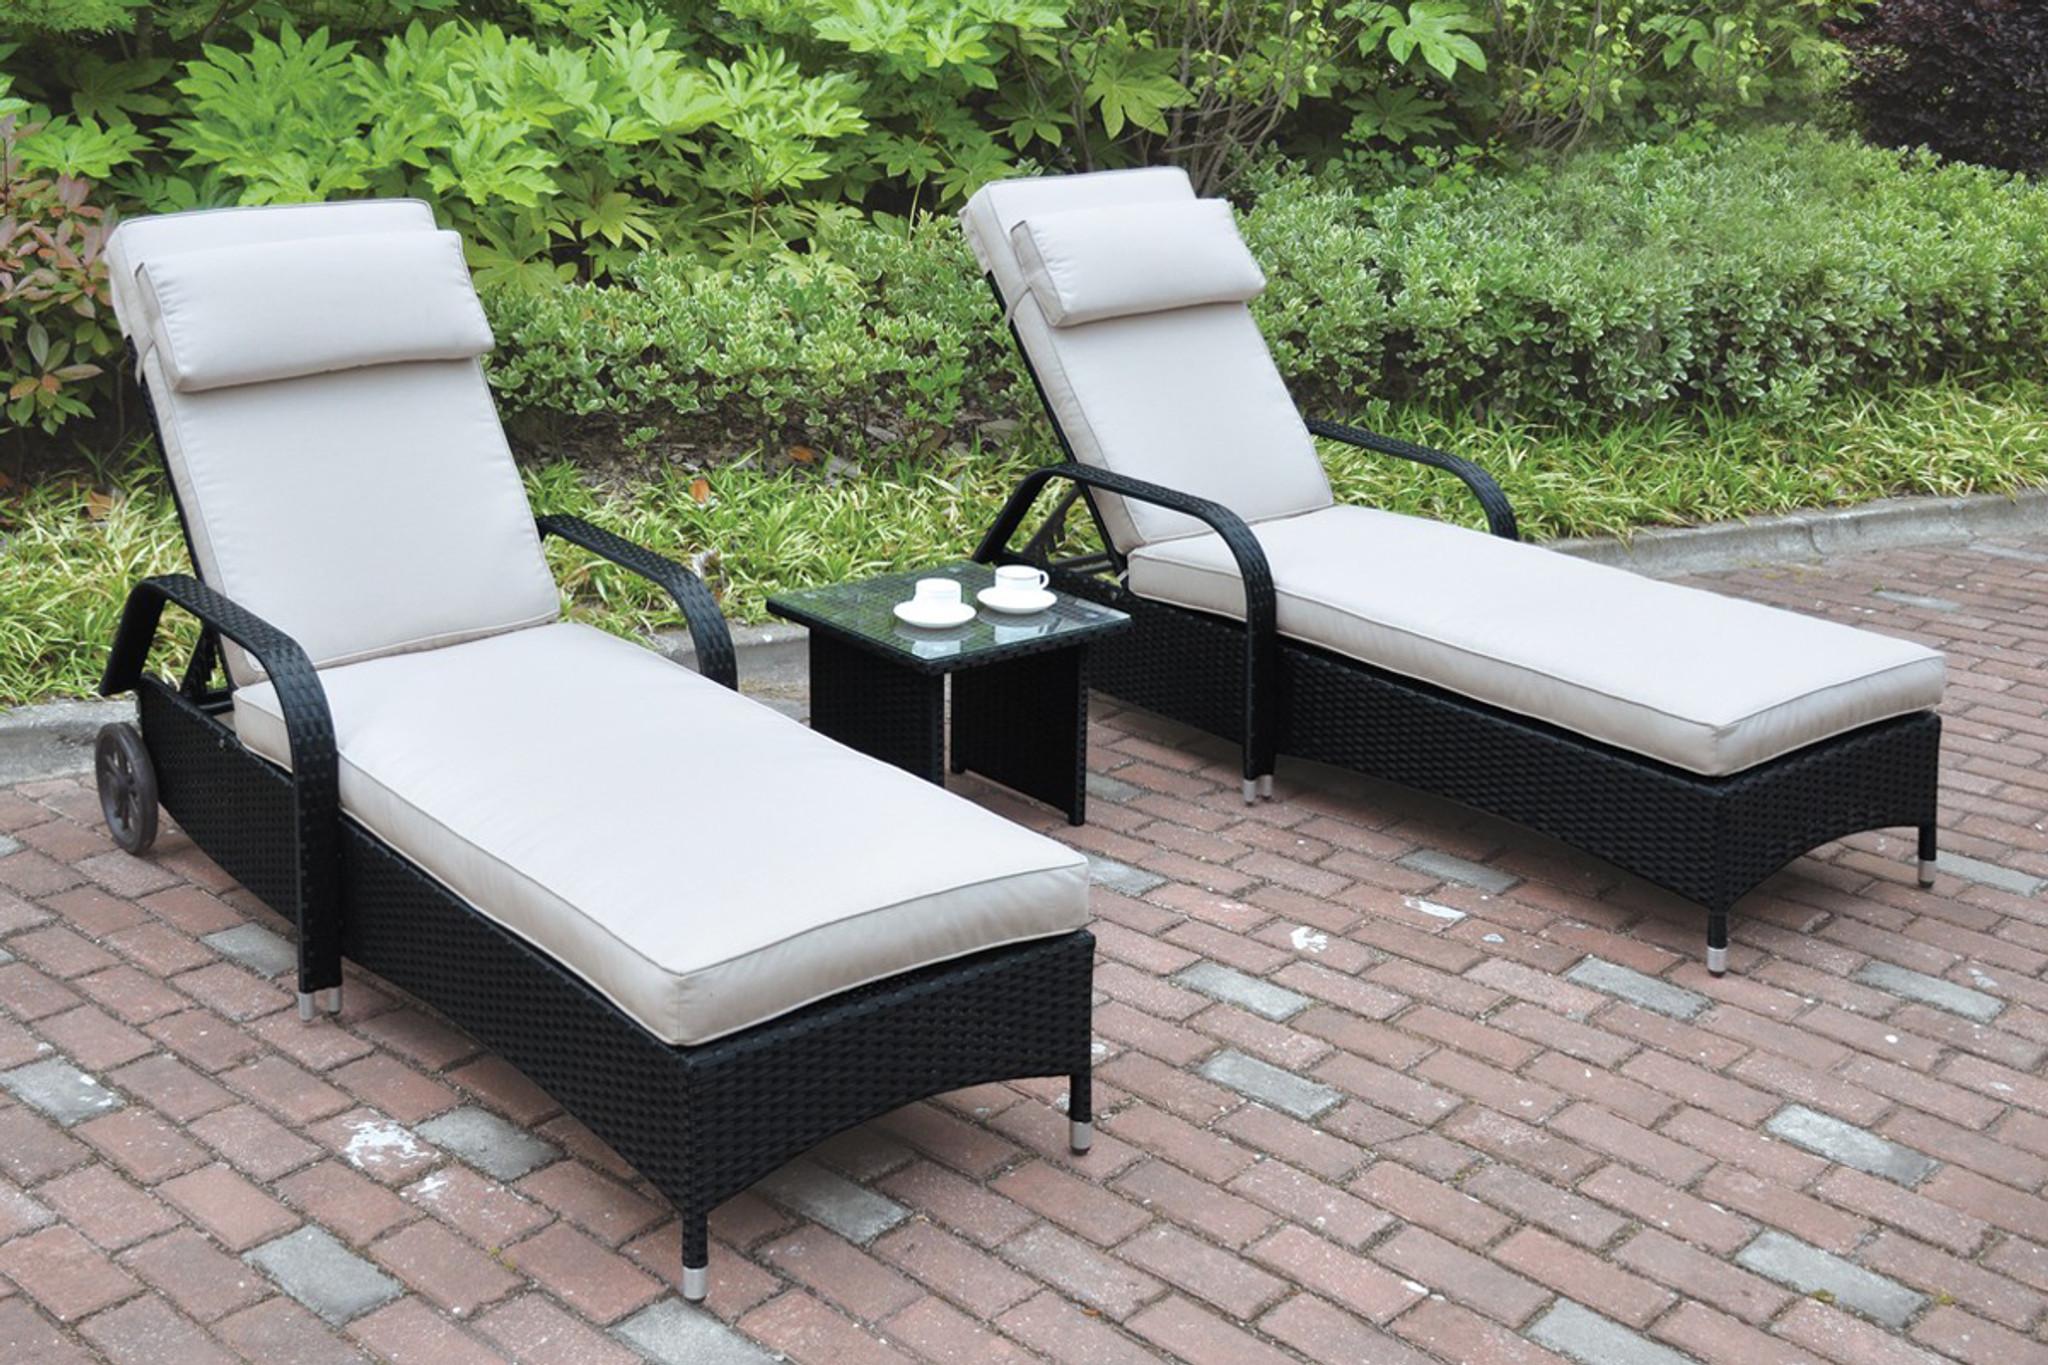 Kassa Mall Home Furniture 430 3pc Outdoor Patio Lounger Set In Dark Brown Resin Walker Finish